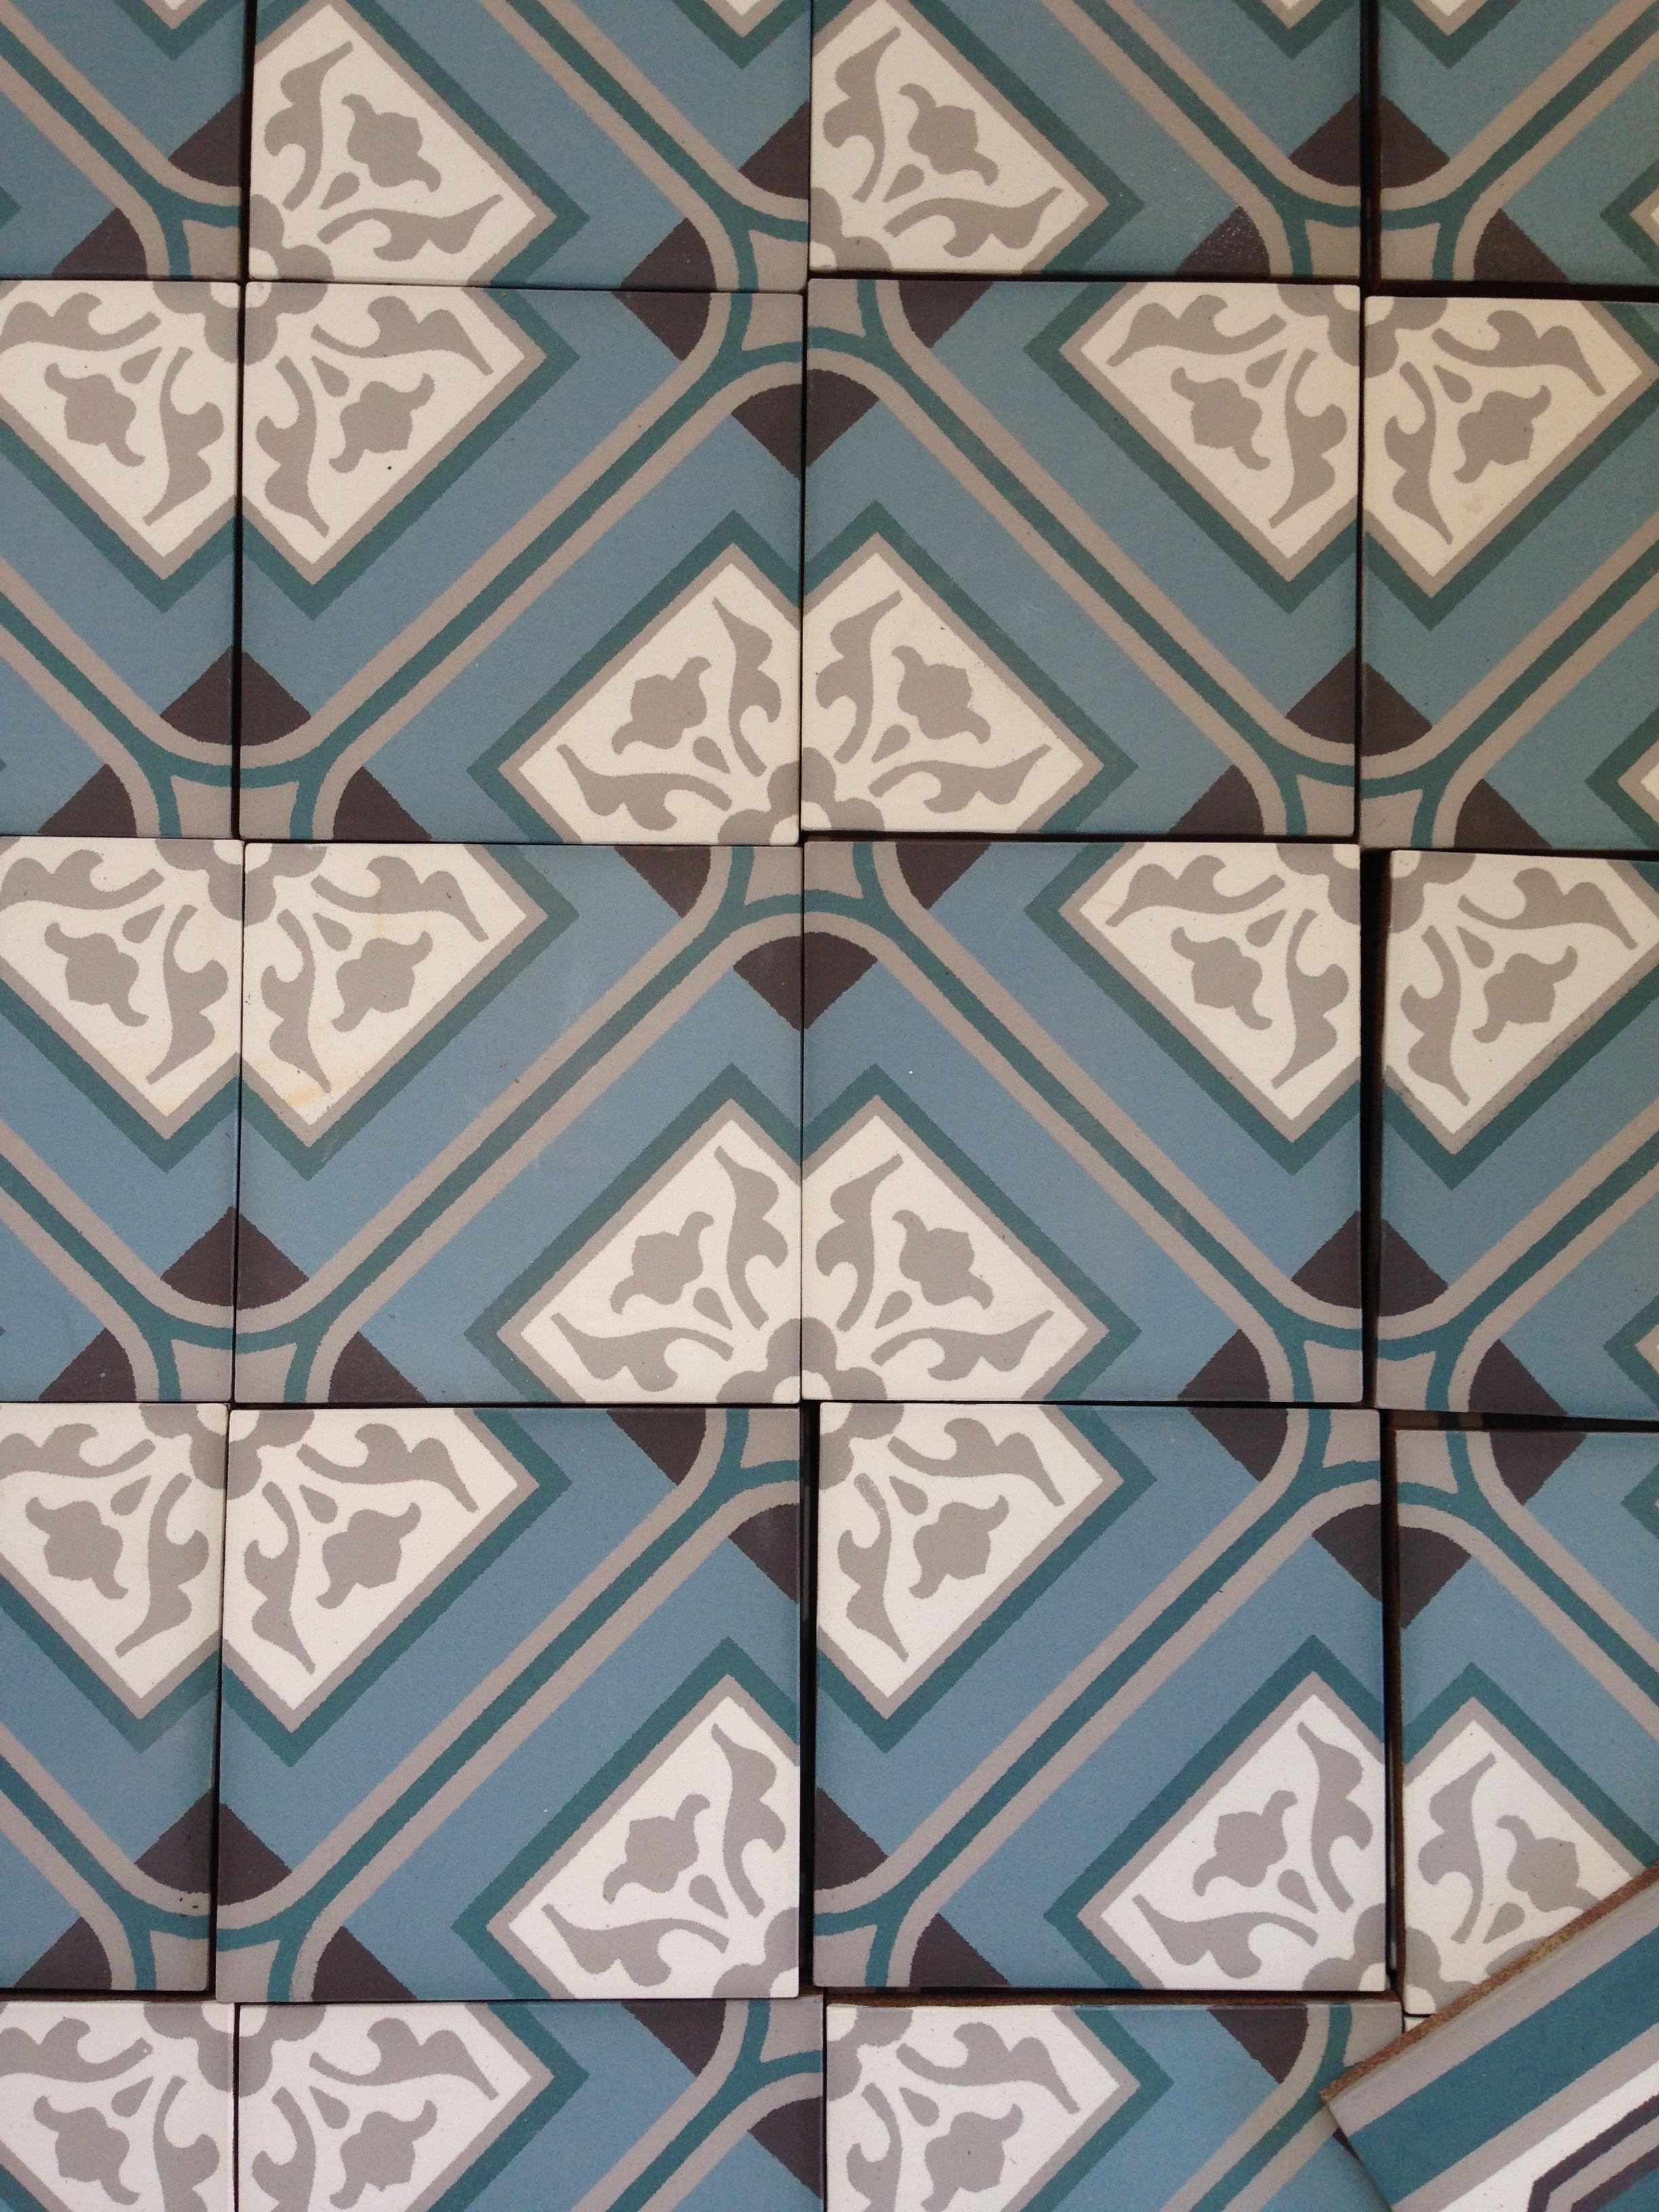 Golem Baukeramik ups an error occurred how floor tiles resistant